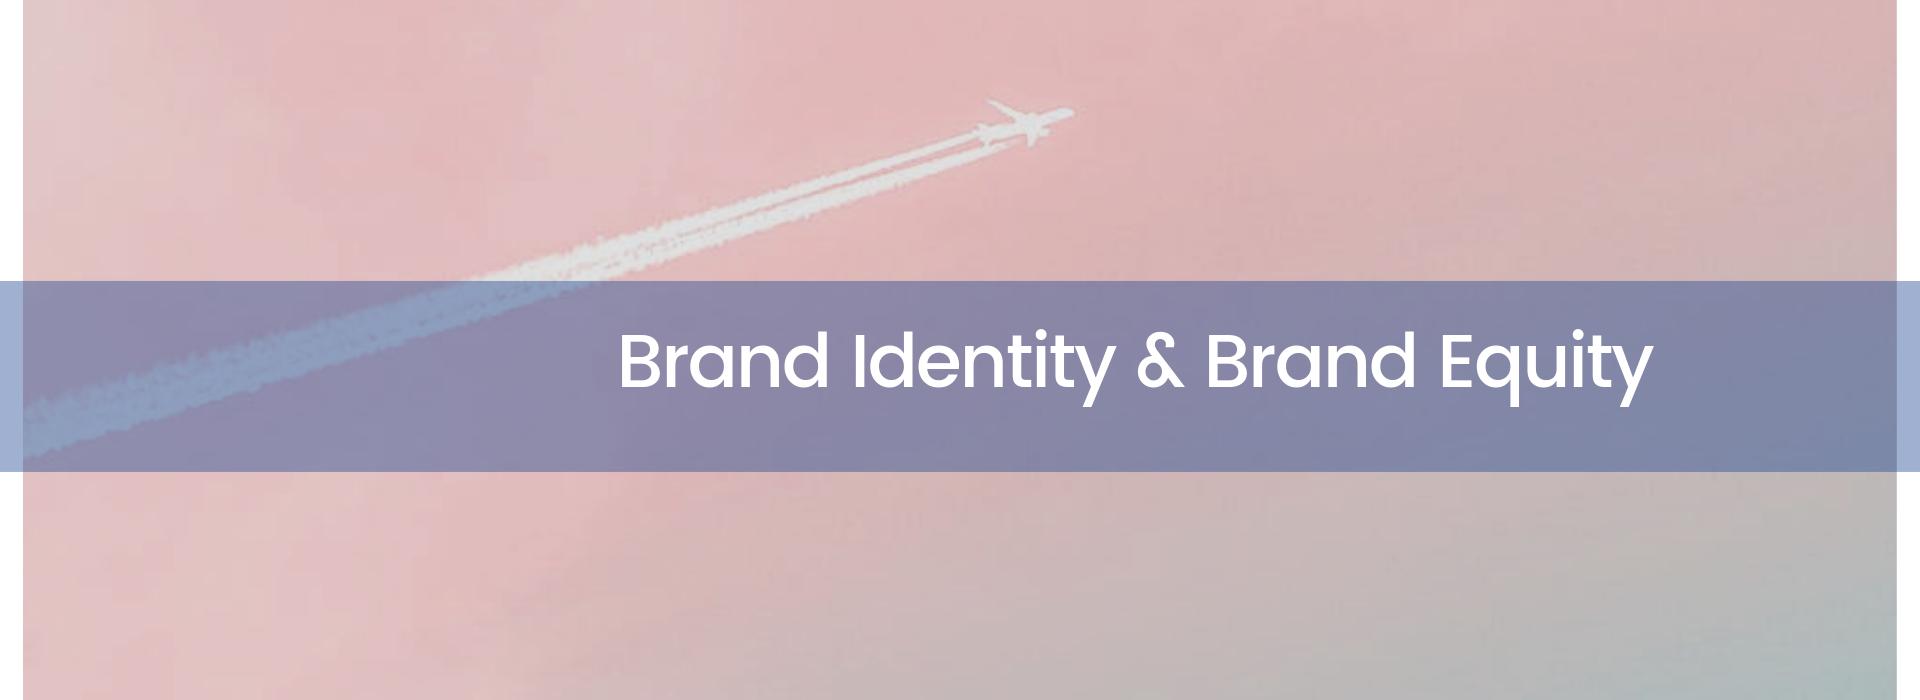 Brand Identity & brand equity